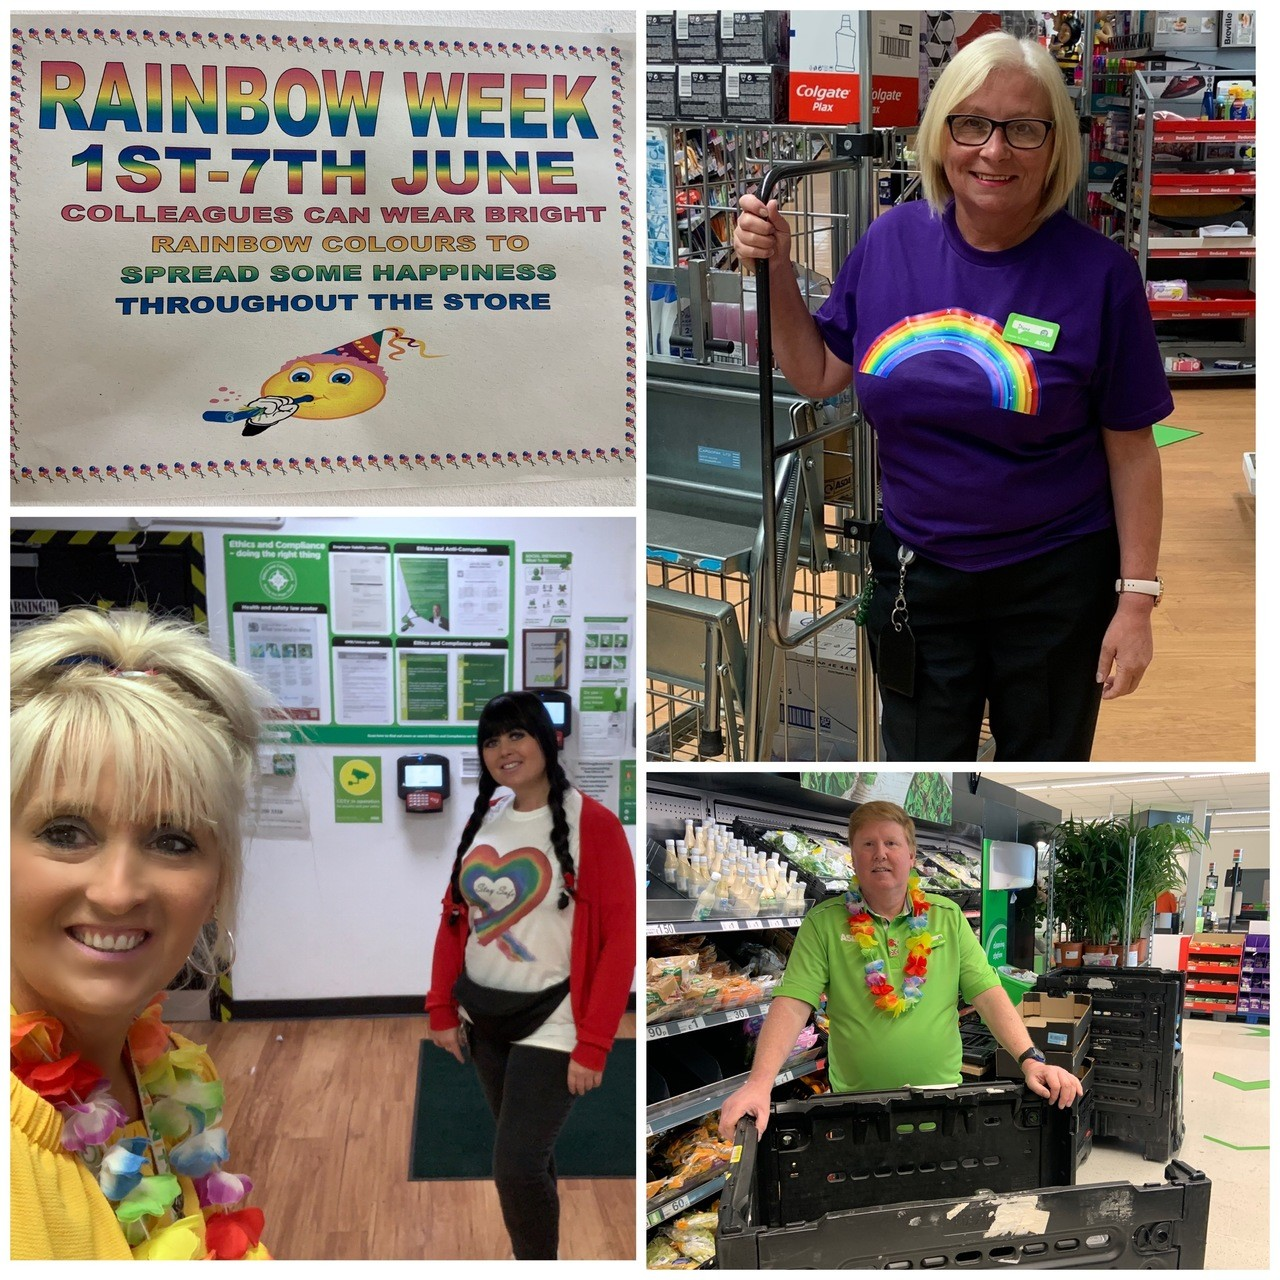 Rainbow Week at Asda Sittingbourne | Asda Sittingbourne